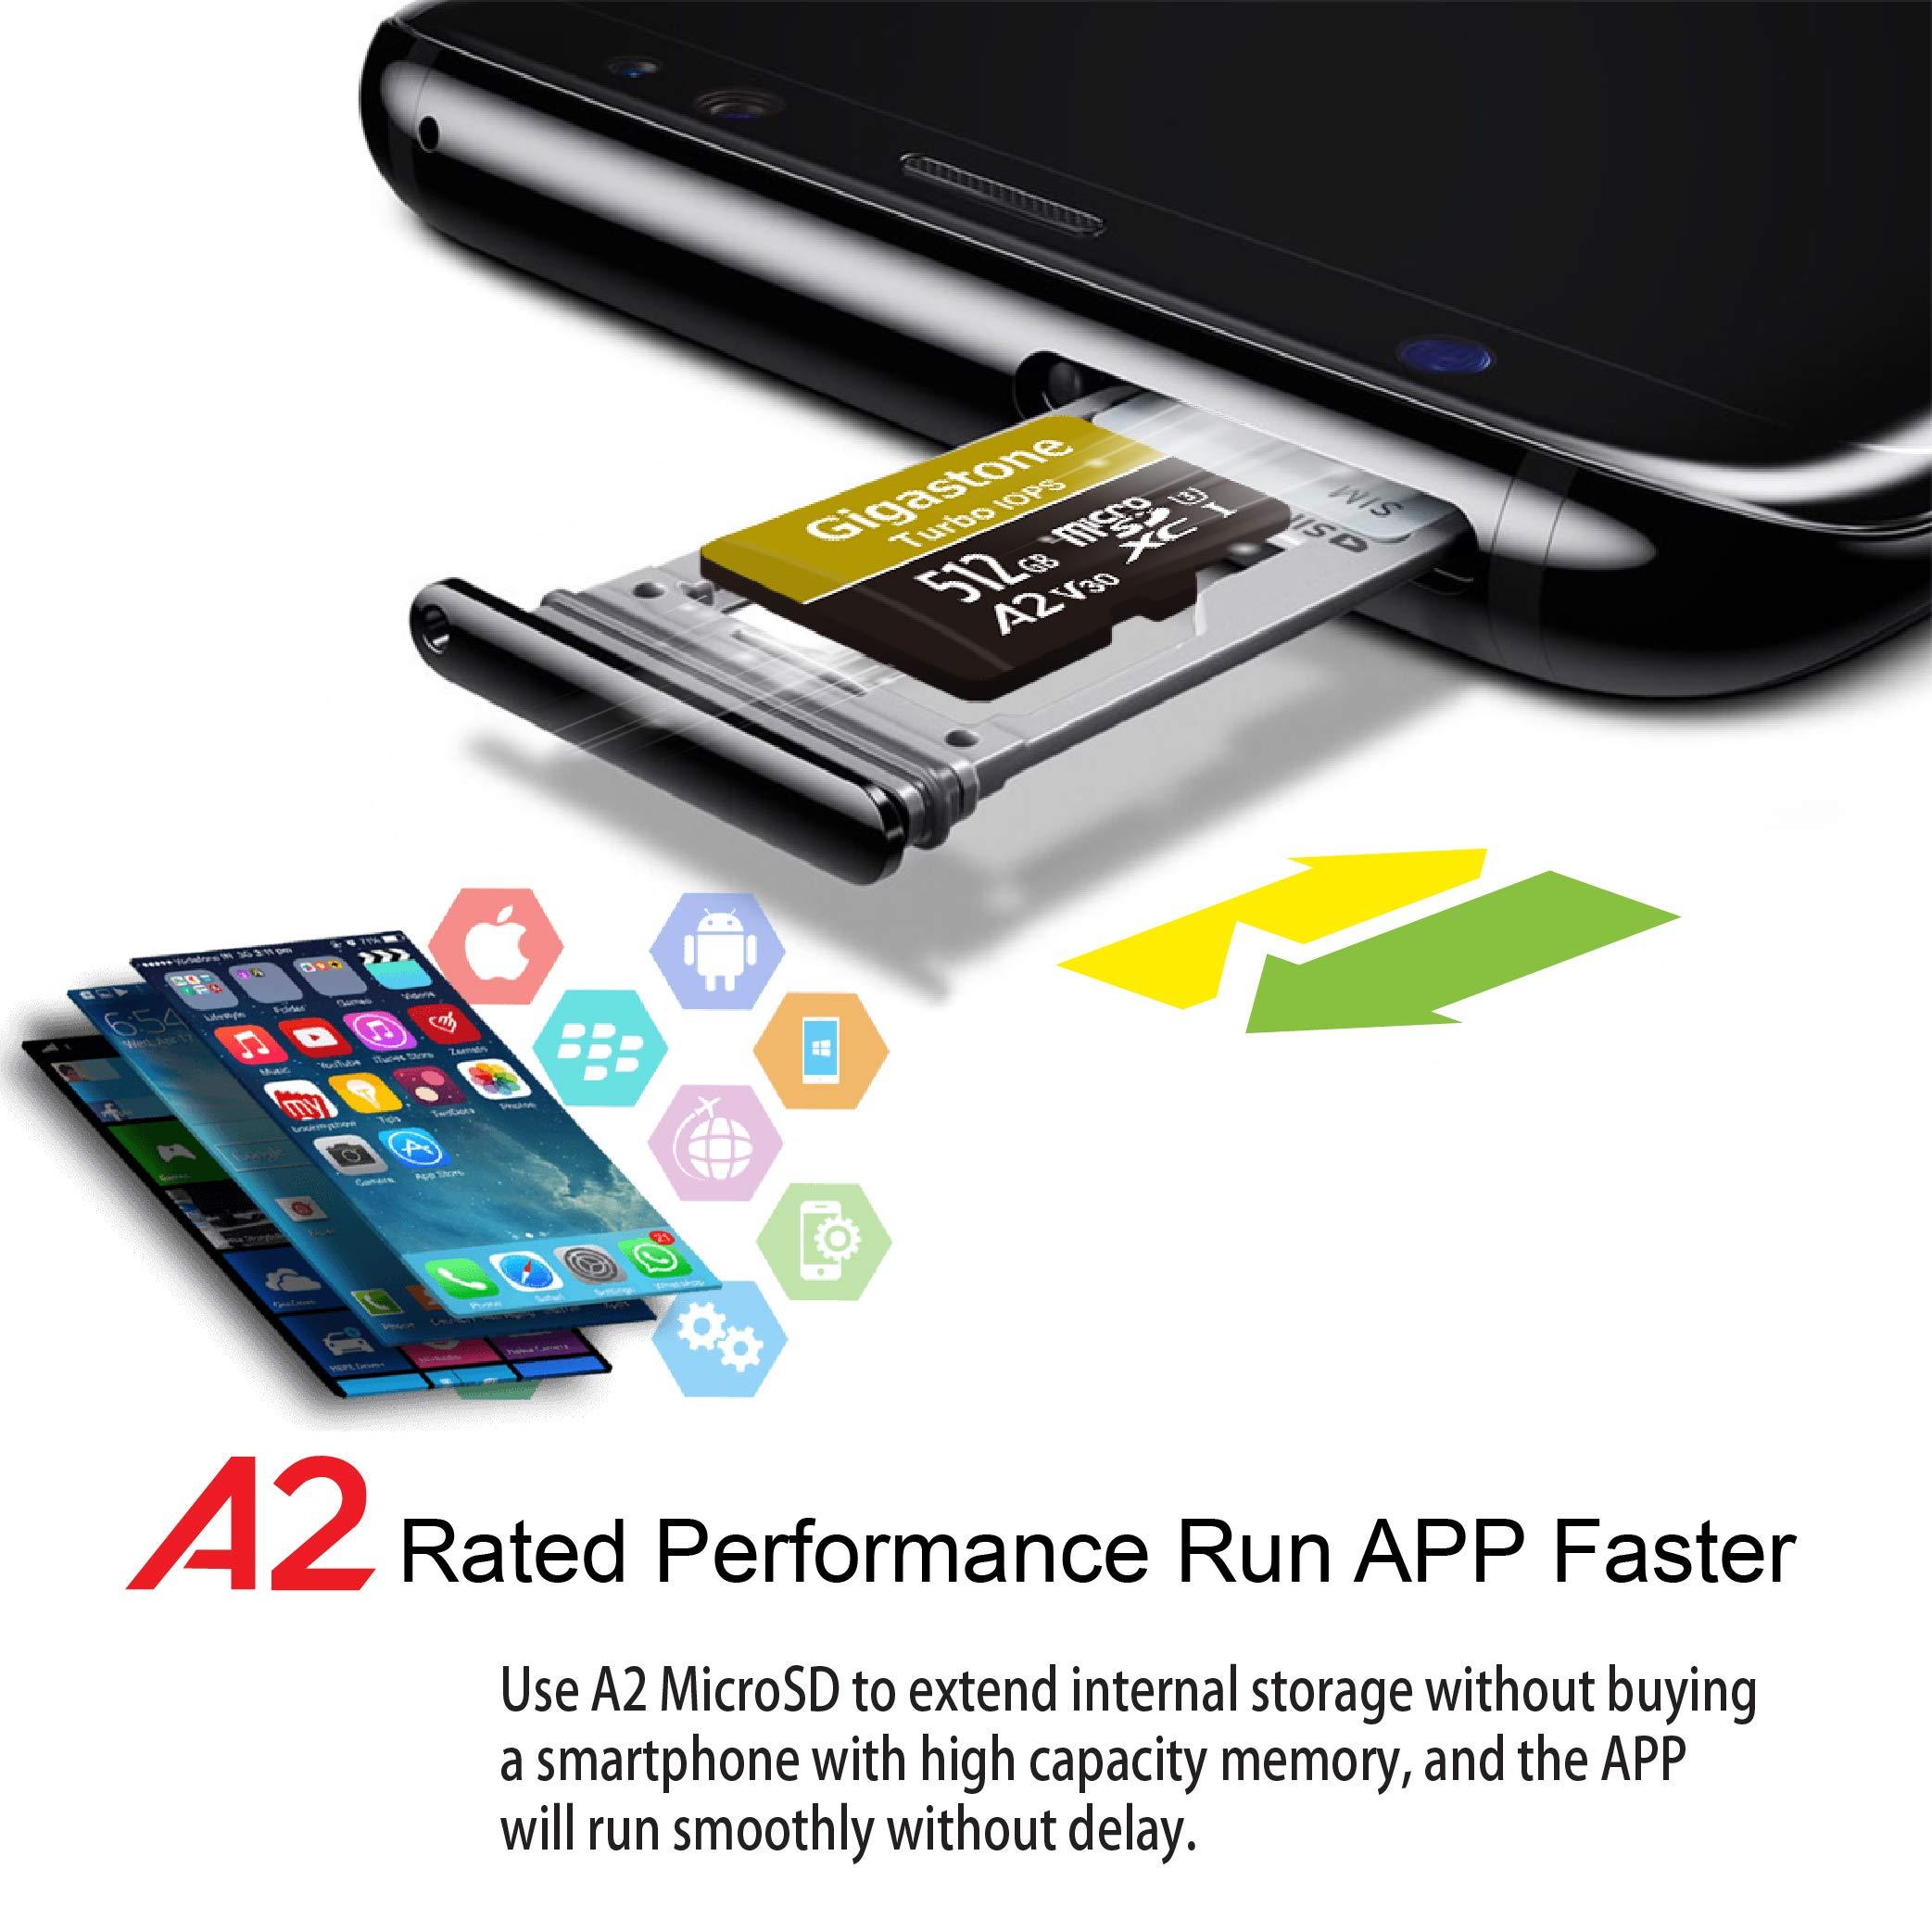 Gigastone 512GB Micro SD Card MicroSD A2 V30 UHS-I U3 Class 10, Run App for Smartphone, UHD 4K Video Recording, 4K Gaming, Read/Write 100/80 MB/s, Compatible Nintendo Dash cam GoPro Camera Tablet by Gigastone